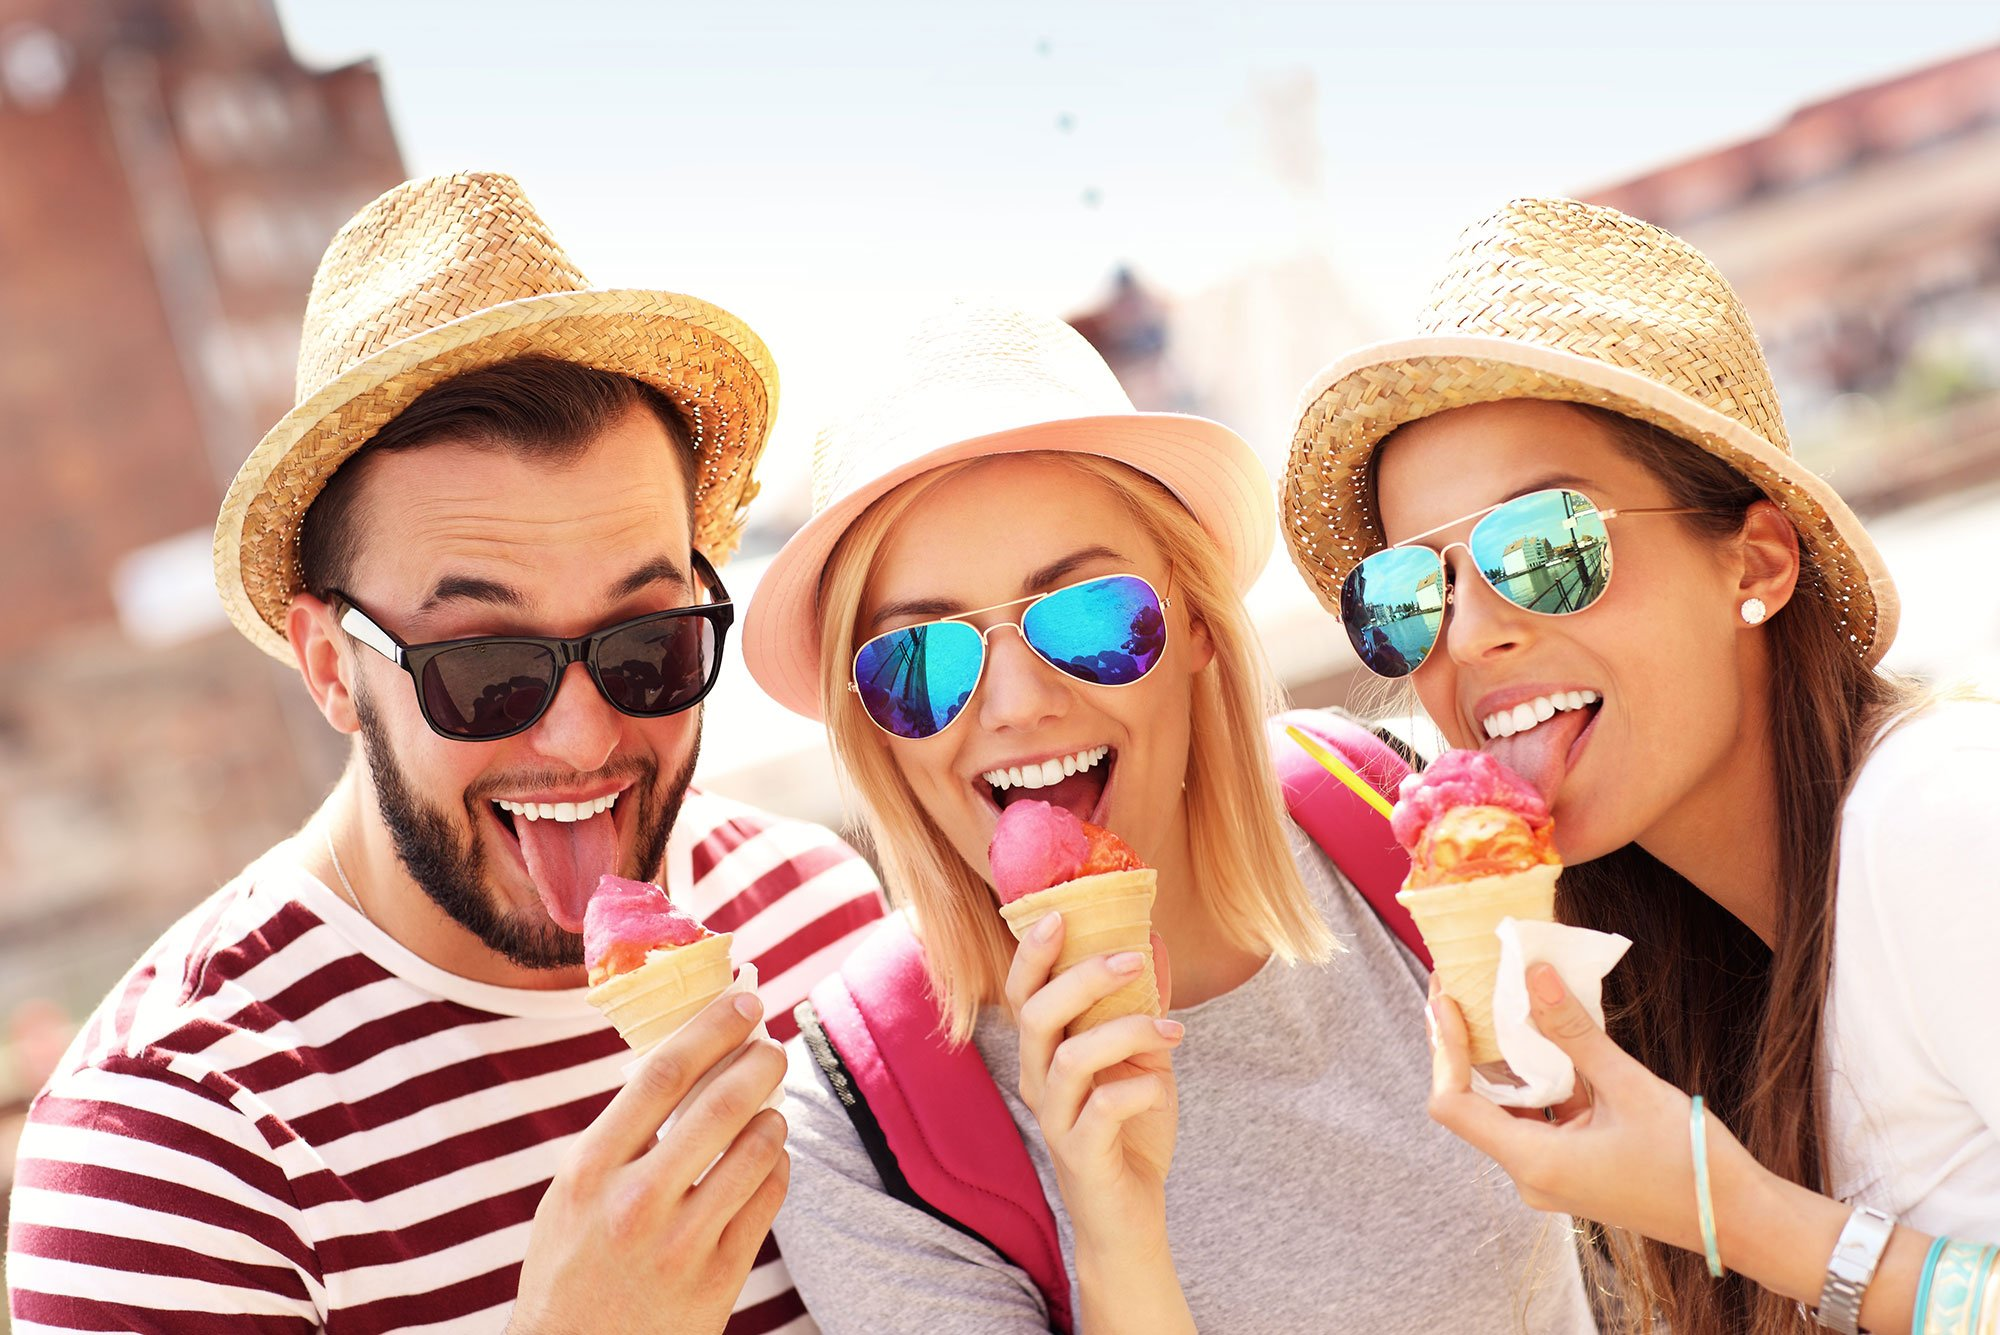 Friends enjoying ice cream cones